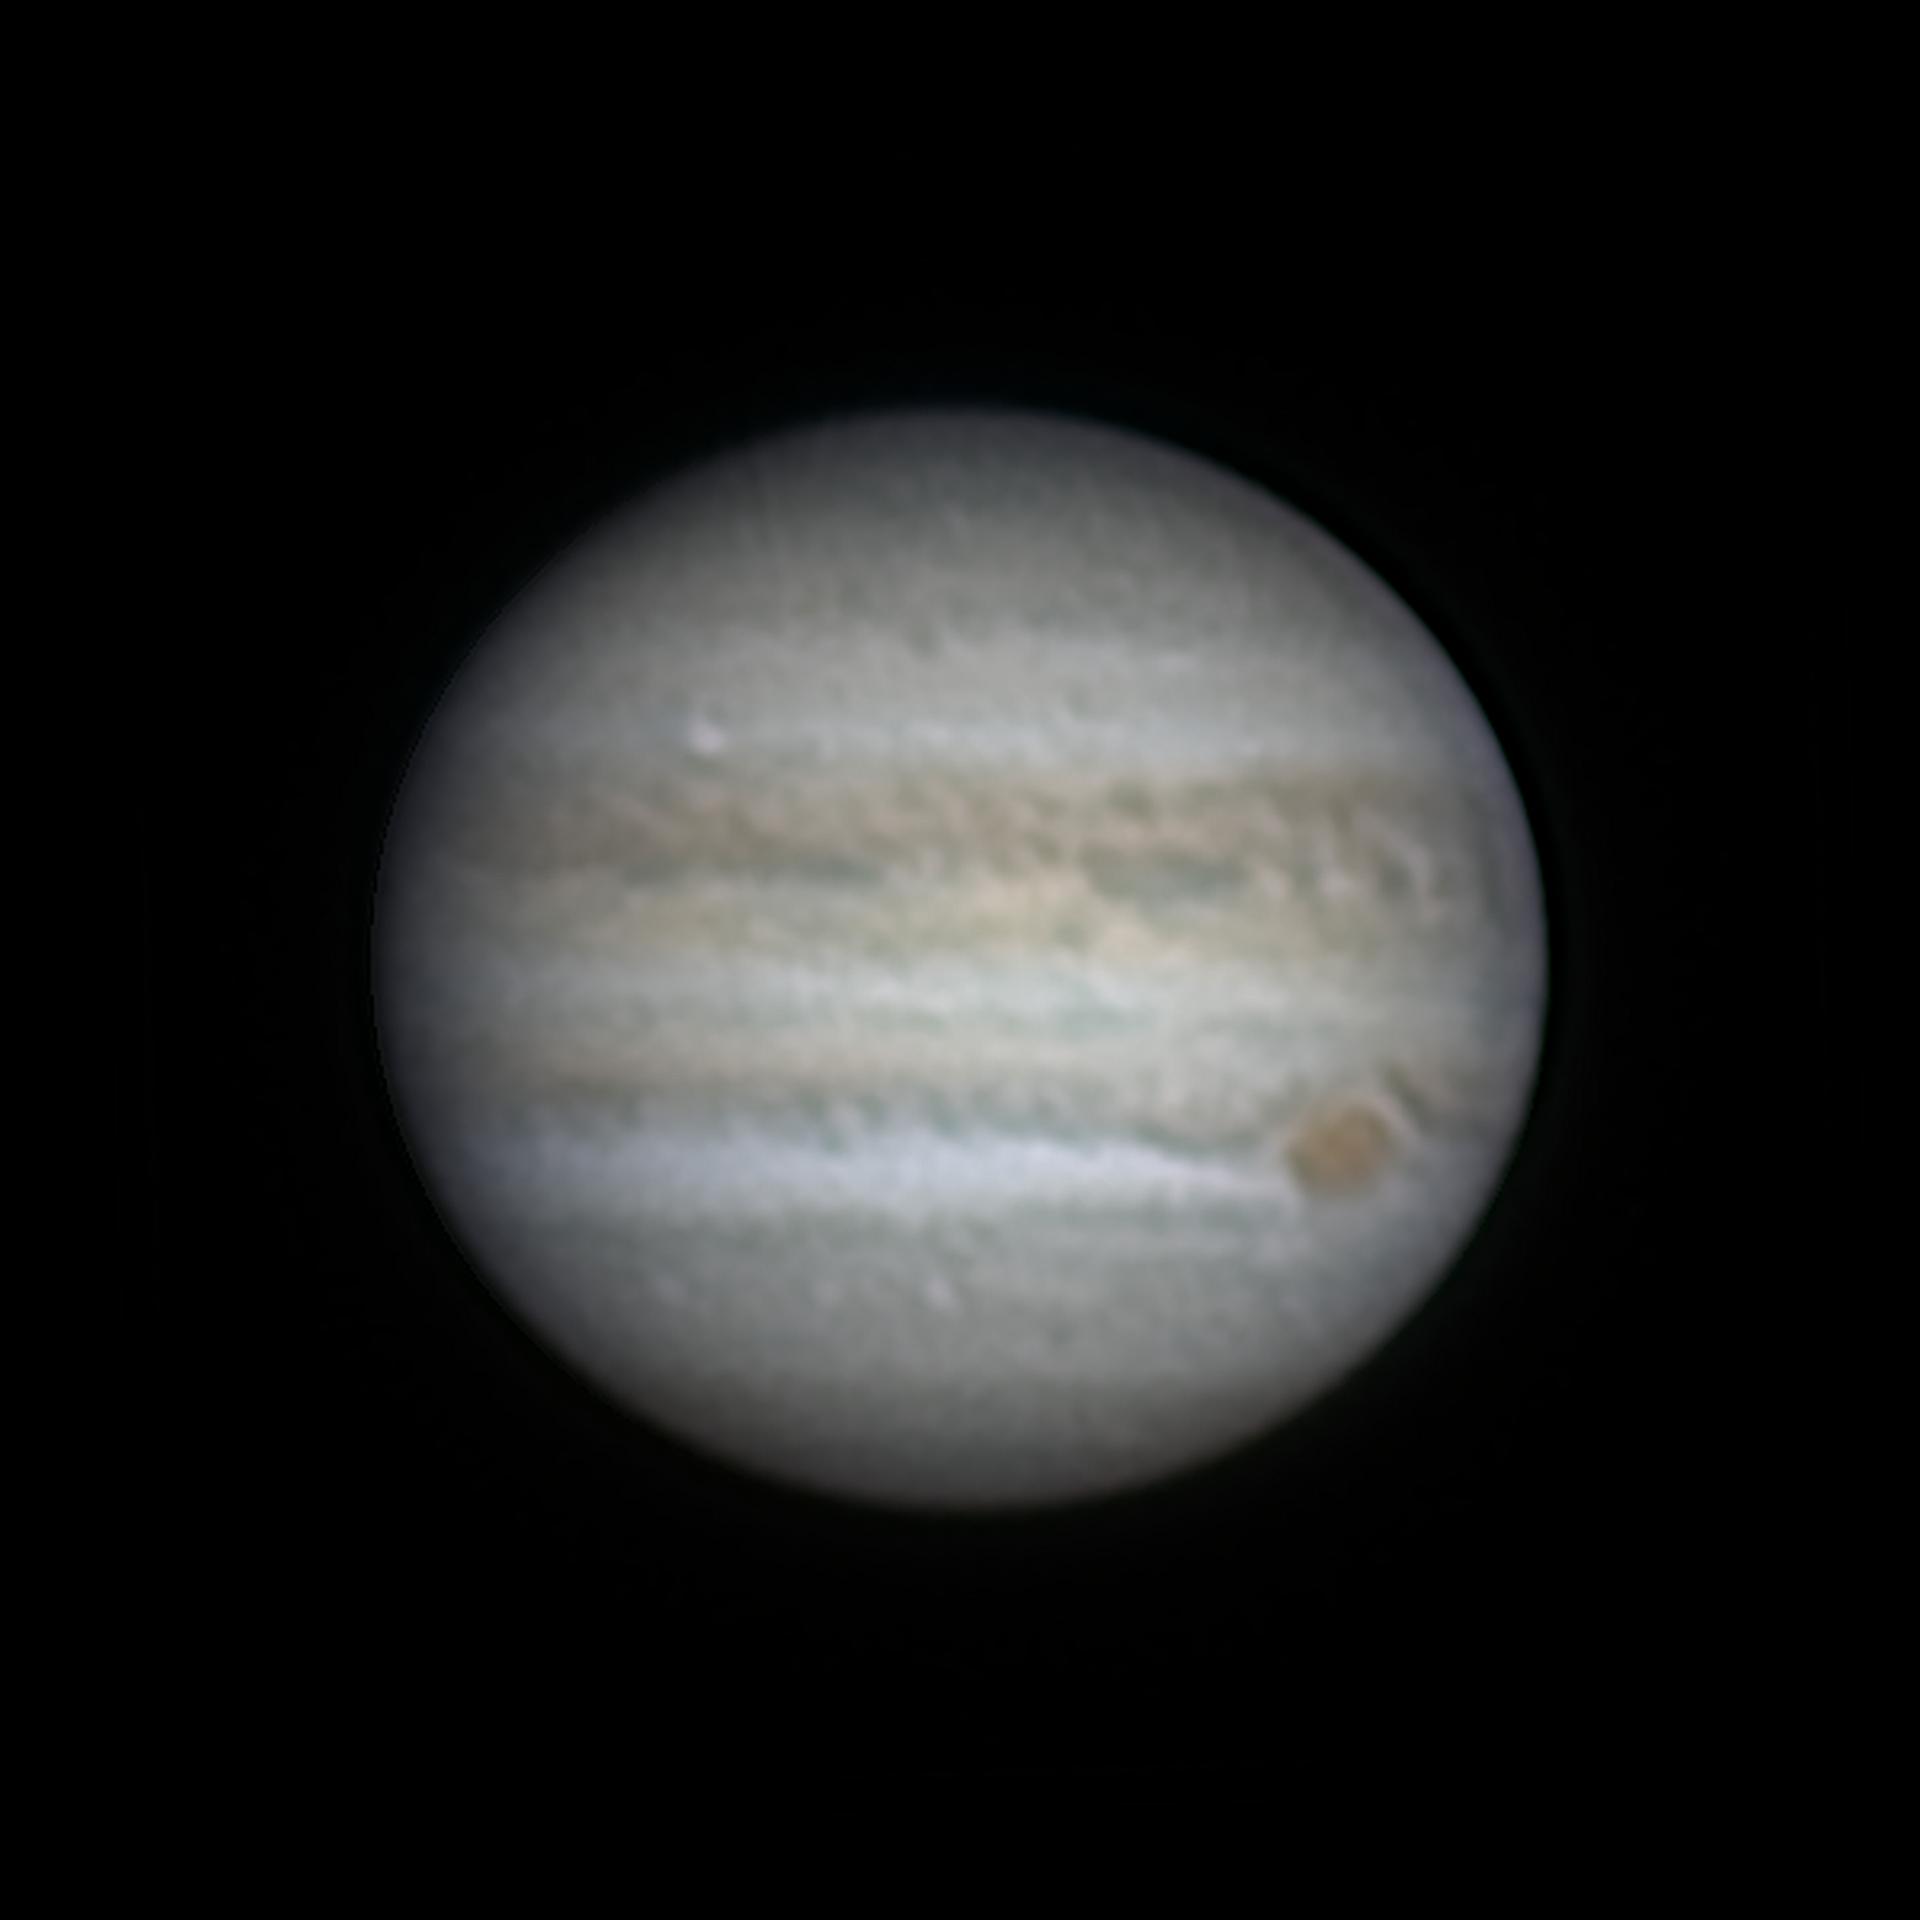 2020-08-21-2011_8-RGB-DEROT.png.d41f746f86b9b8546e7c7e2365a016f3.png